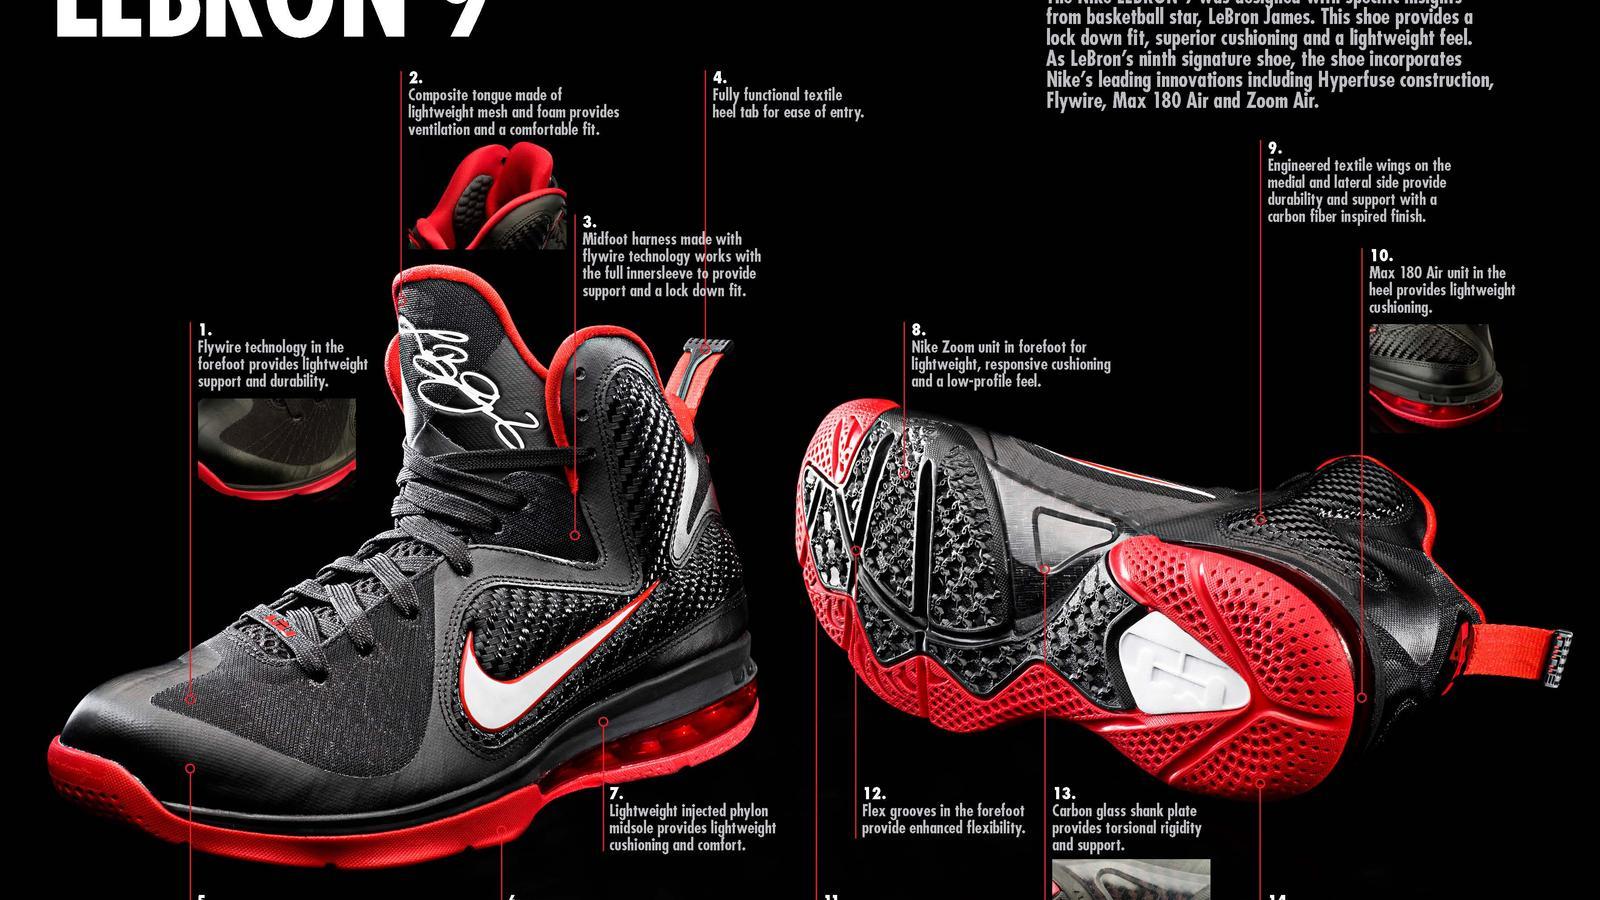 Nike defines basketball performance